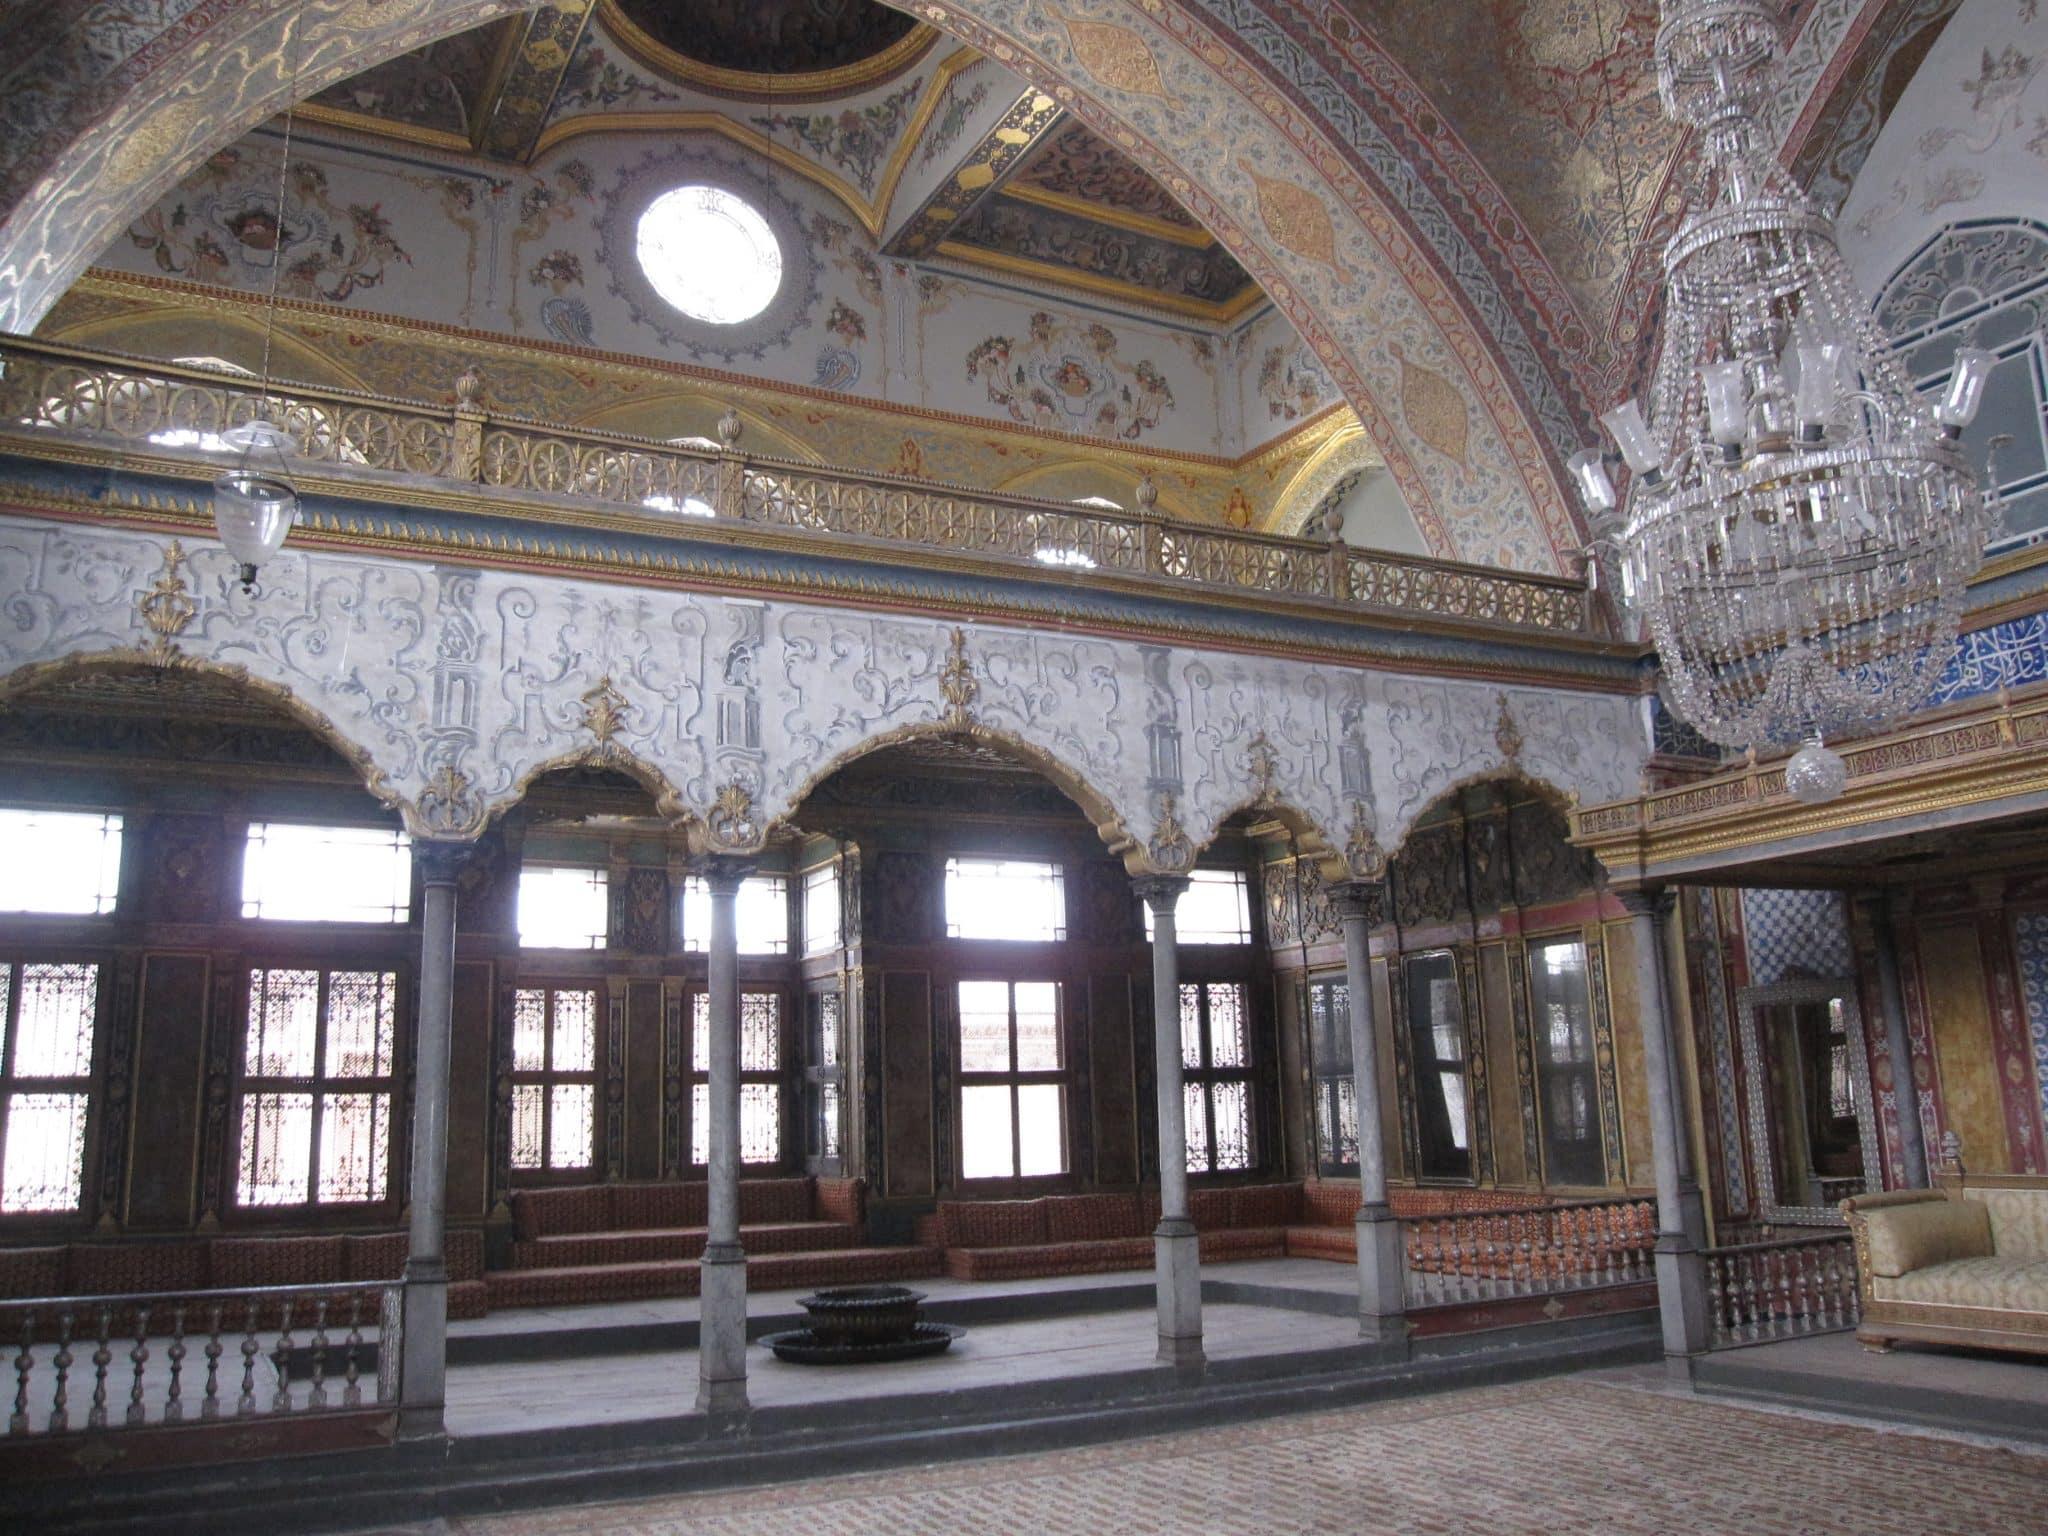 turkey-istanbul-topkapi-palace-harem-room-elaborate-interior